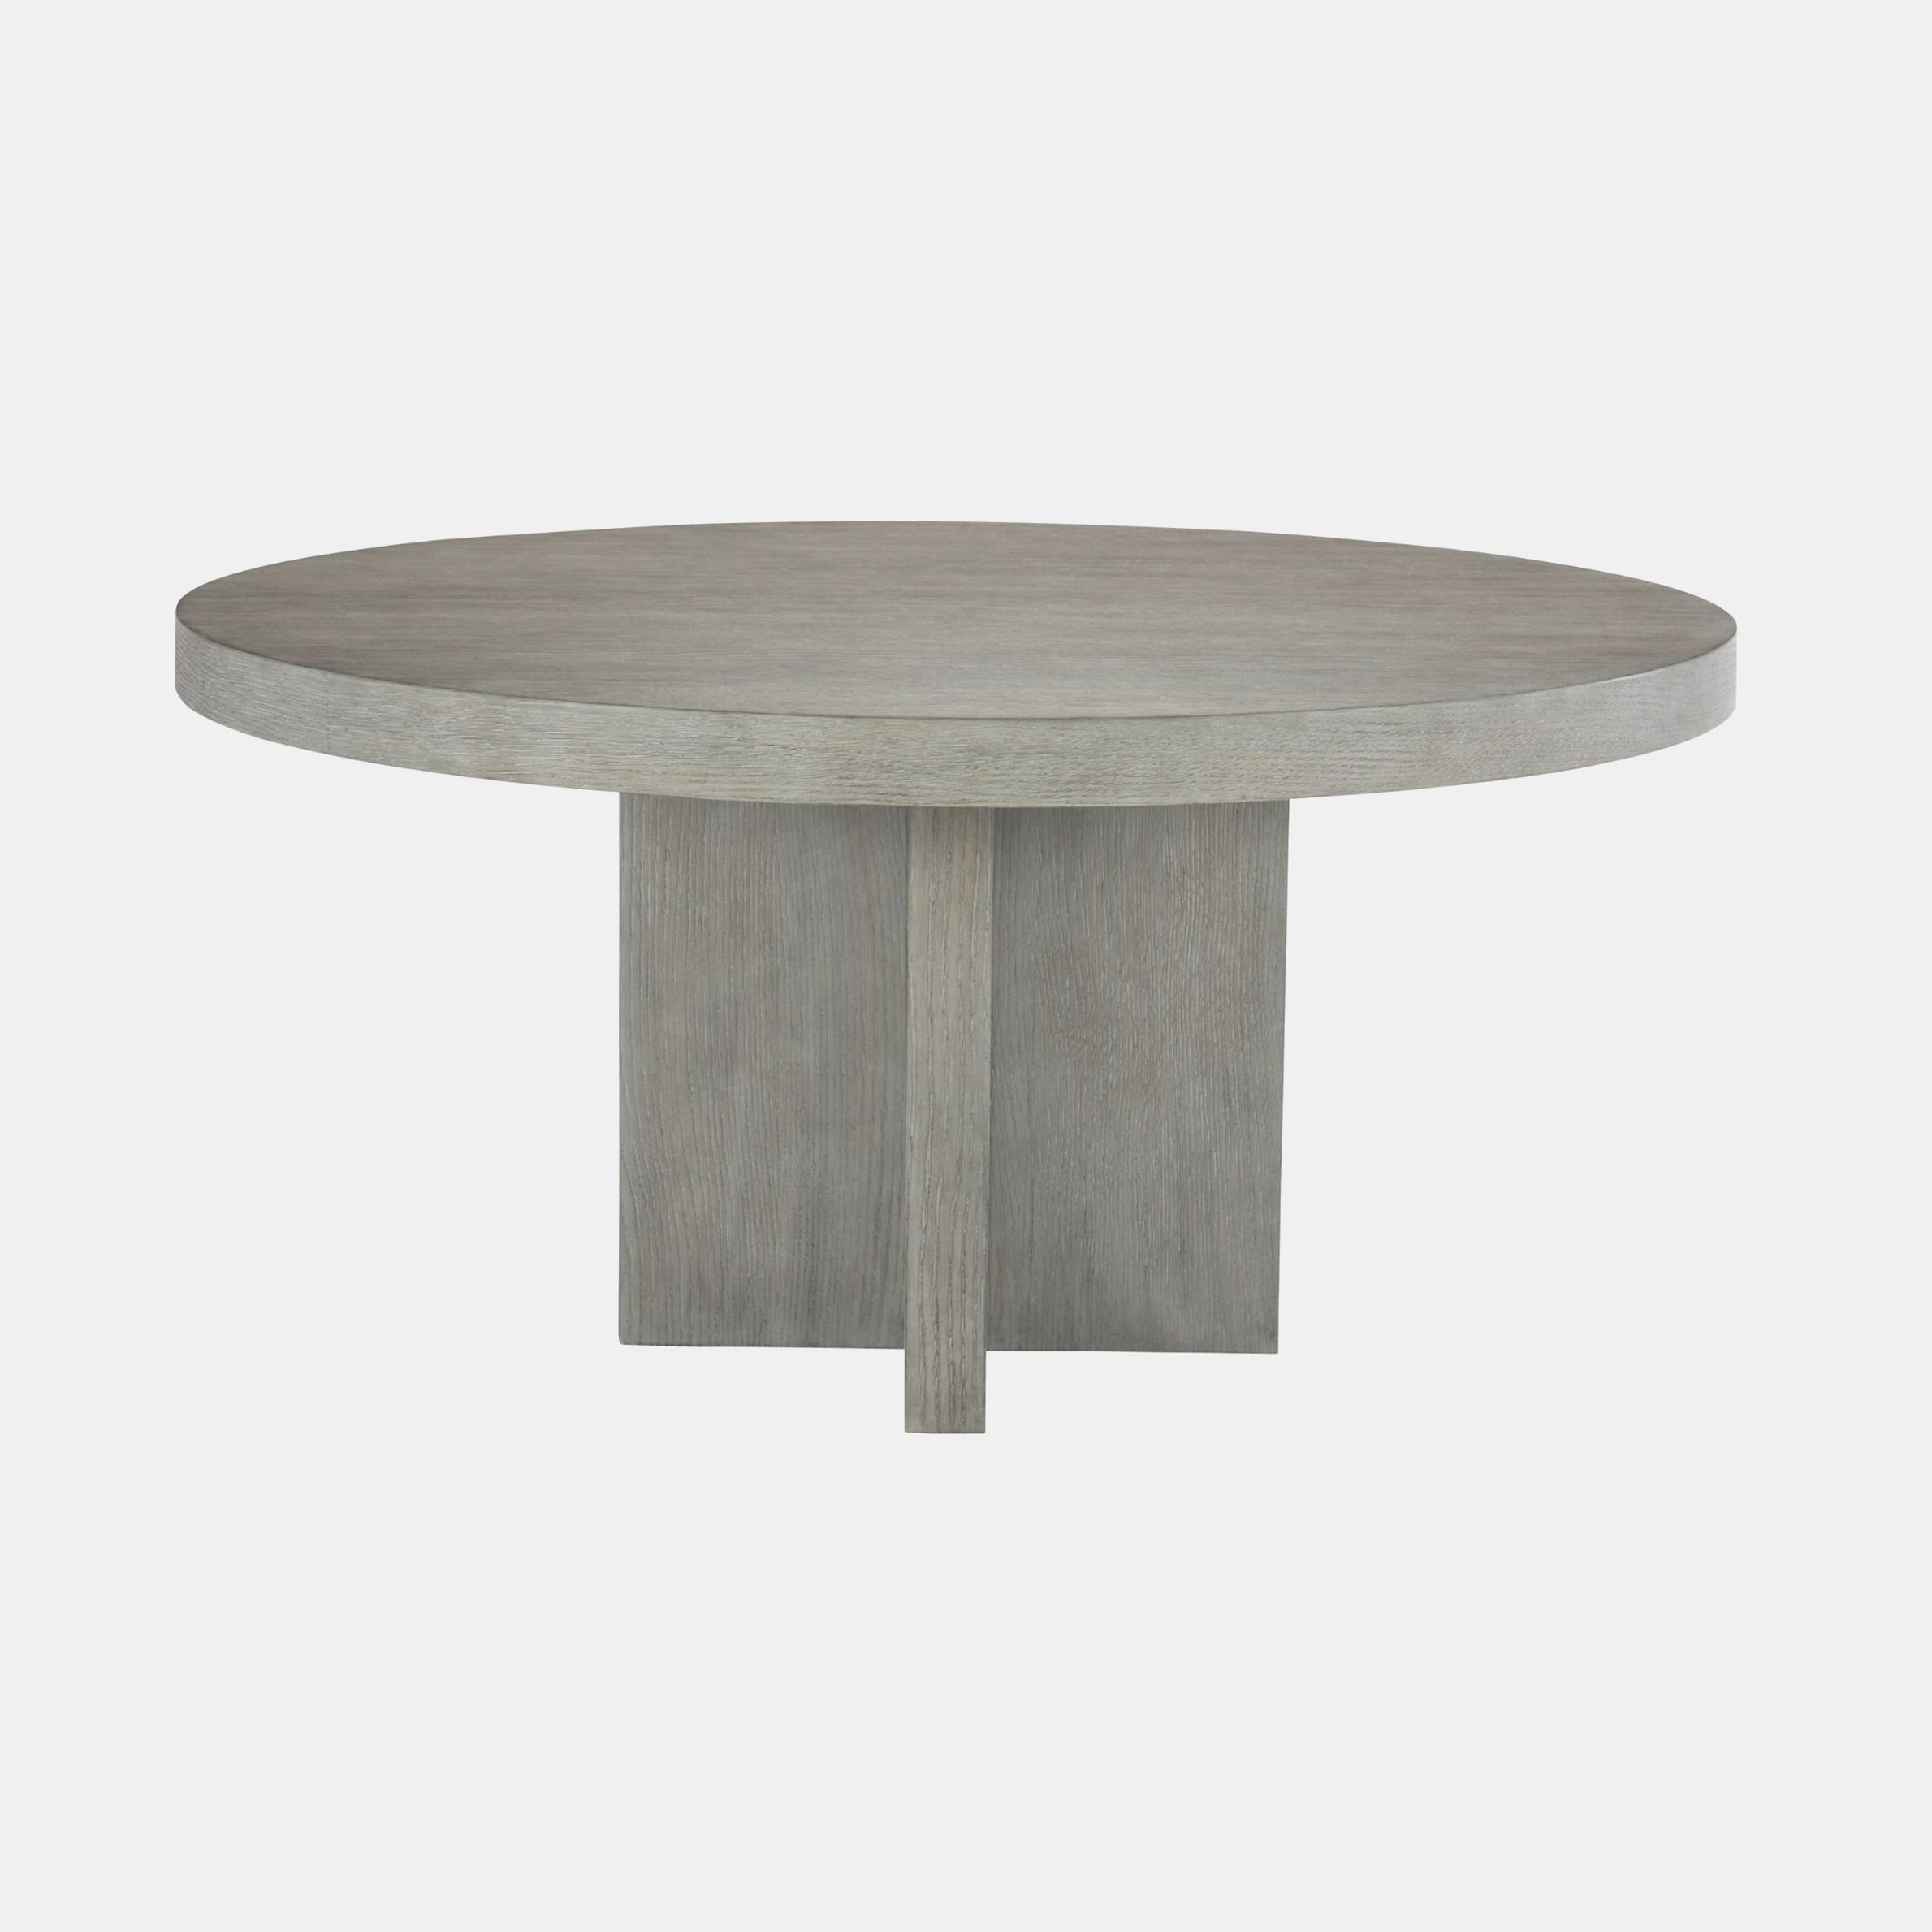 "Adler Dining Table  60"" round x 29.75"" h SKU109BHT"